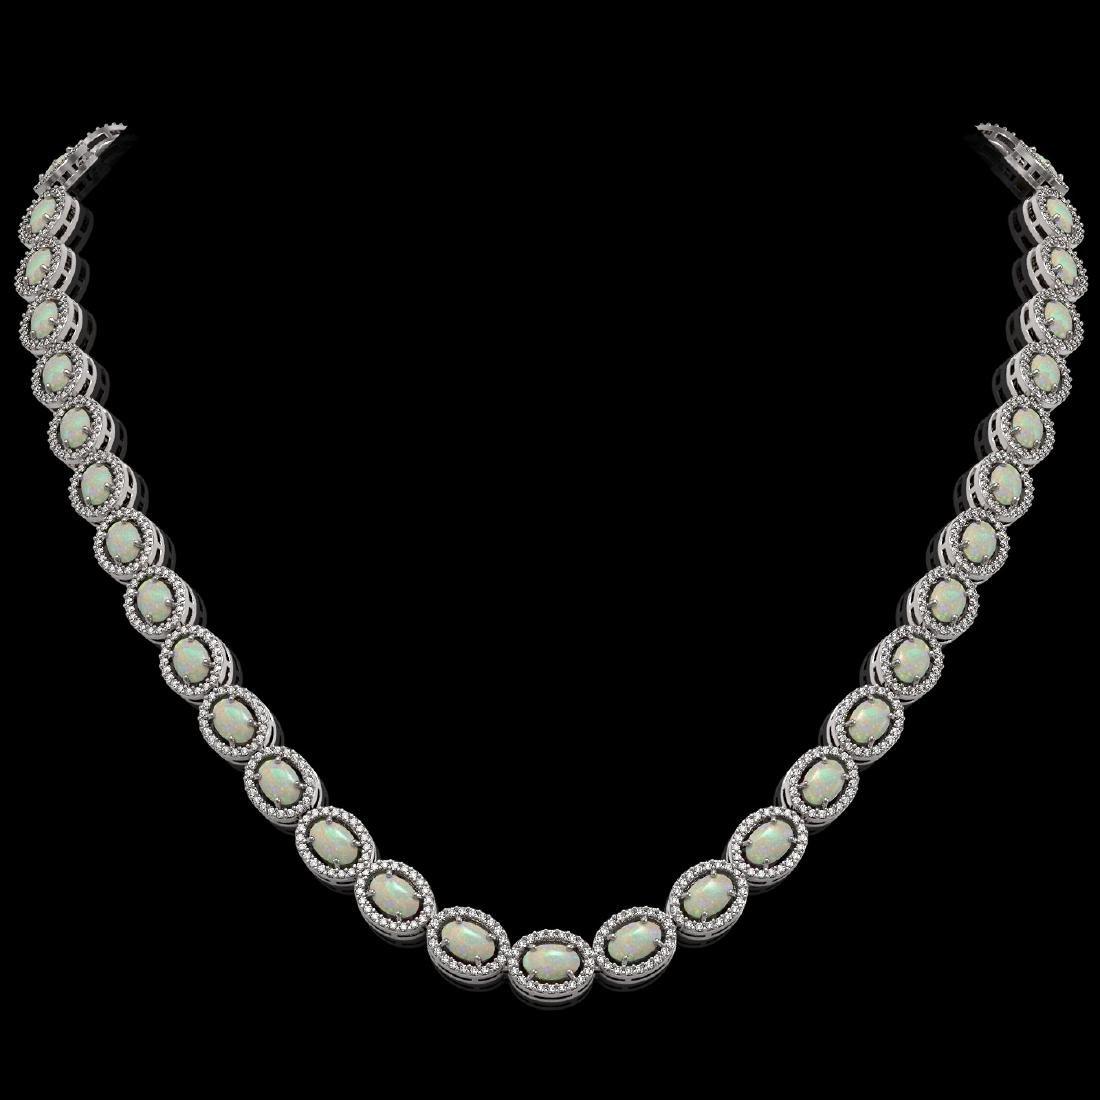 21.21 CTW Opal & Diamond Halo Necklace 10K White Gold